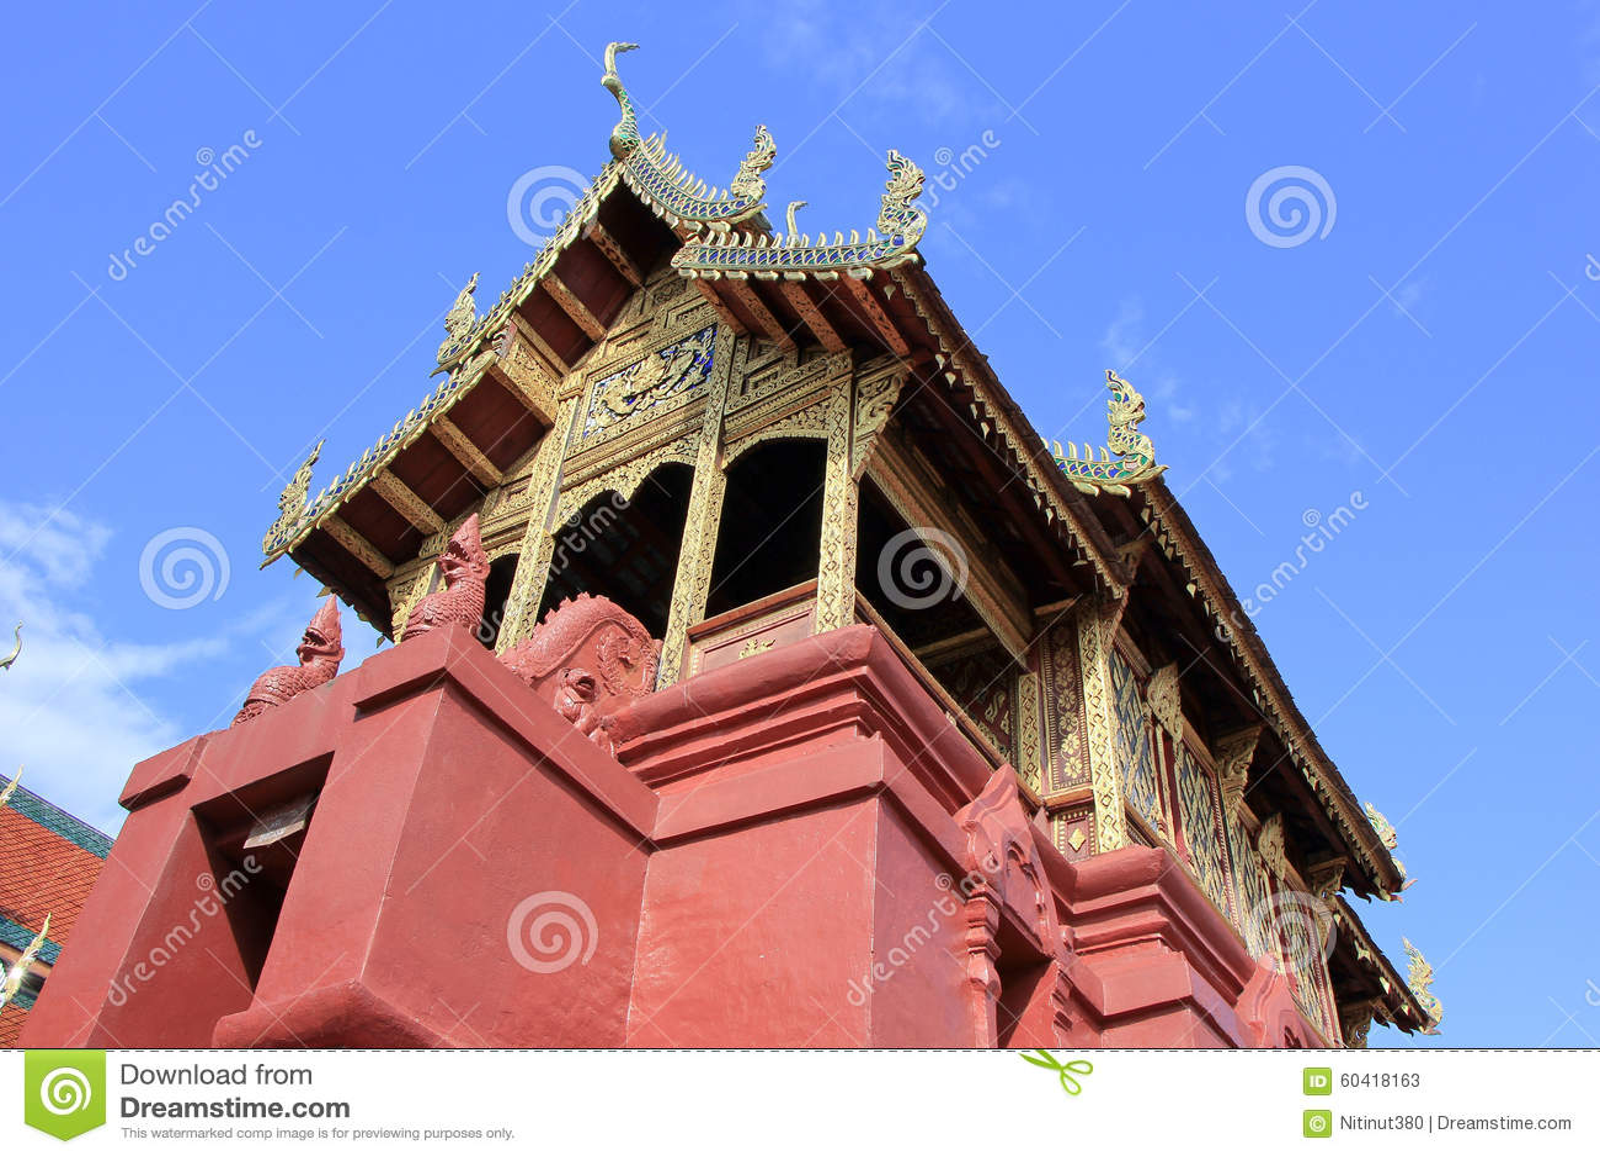 Wat phra hariphunchai